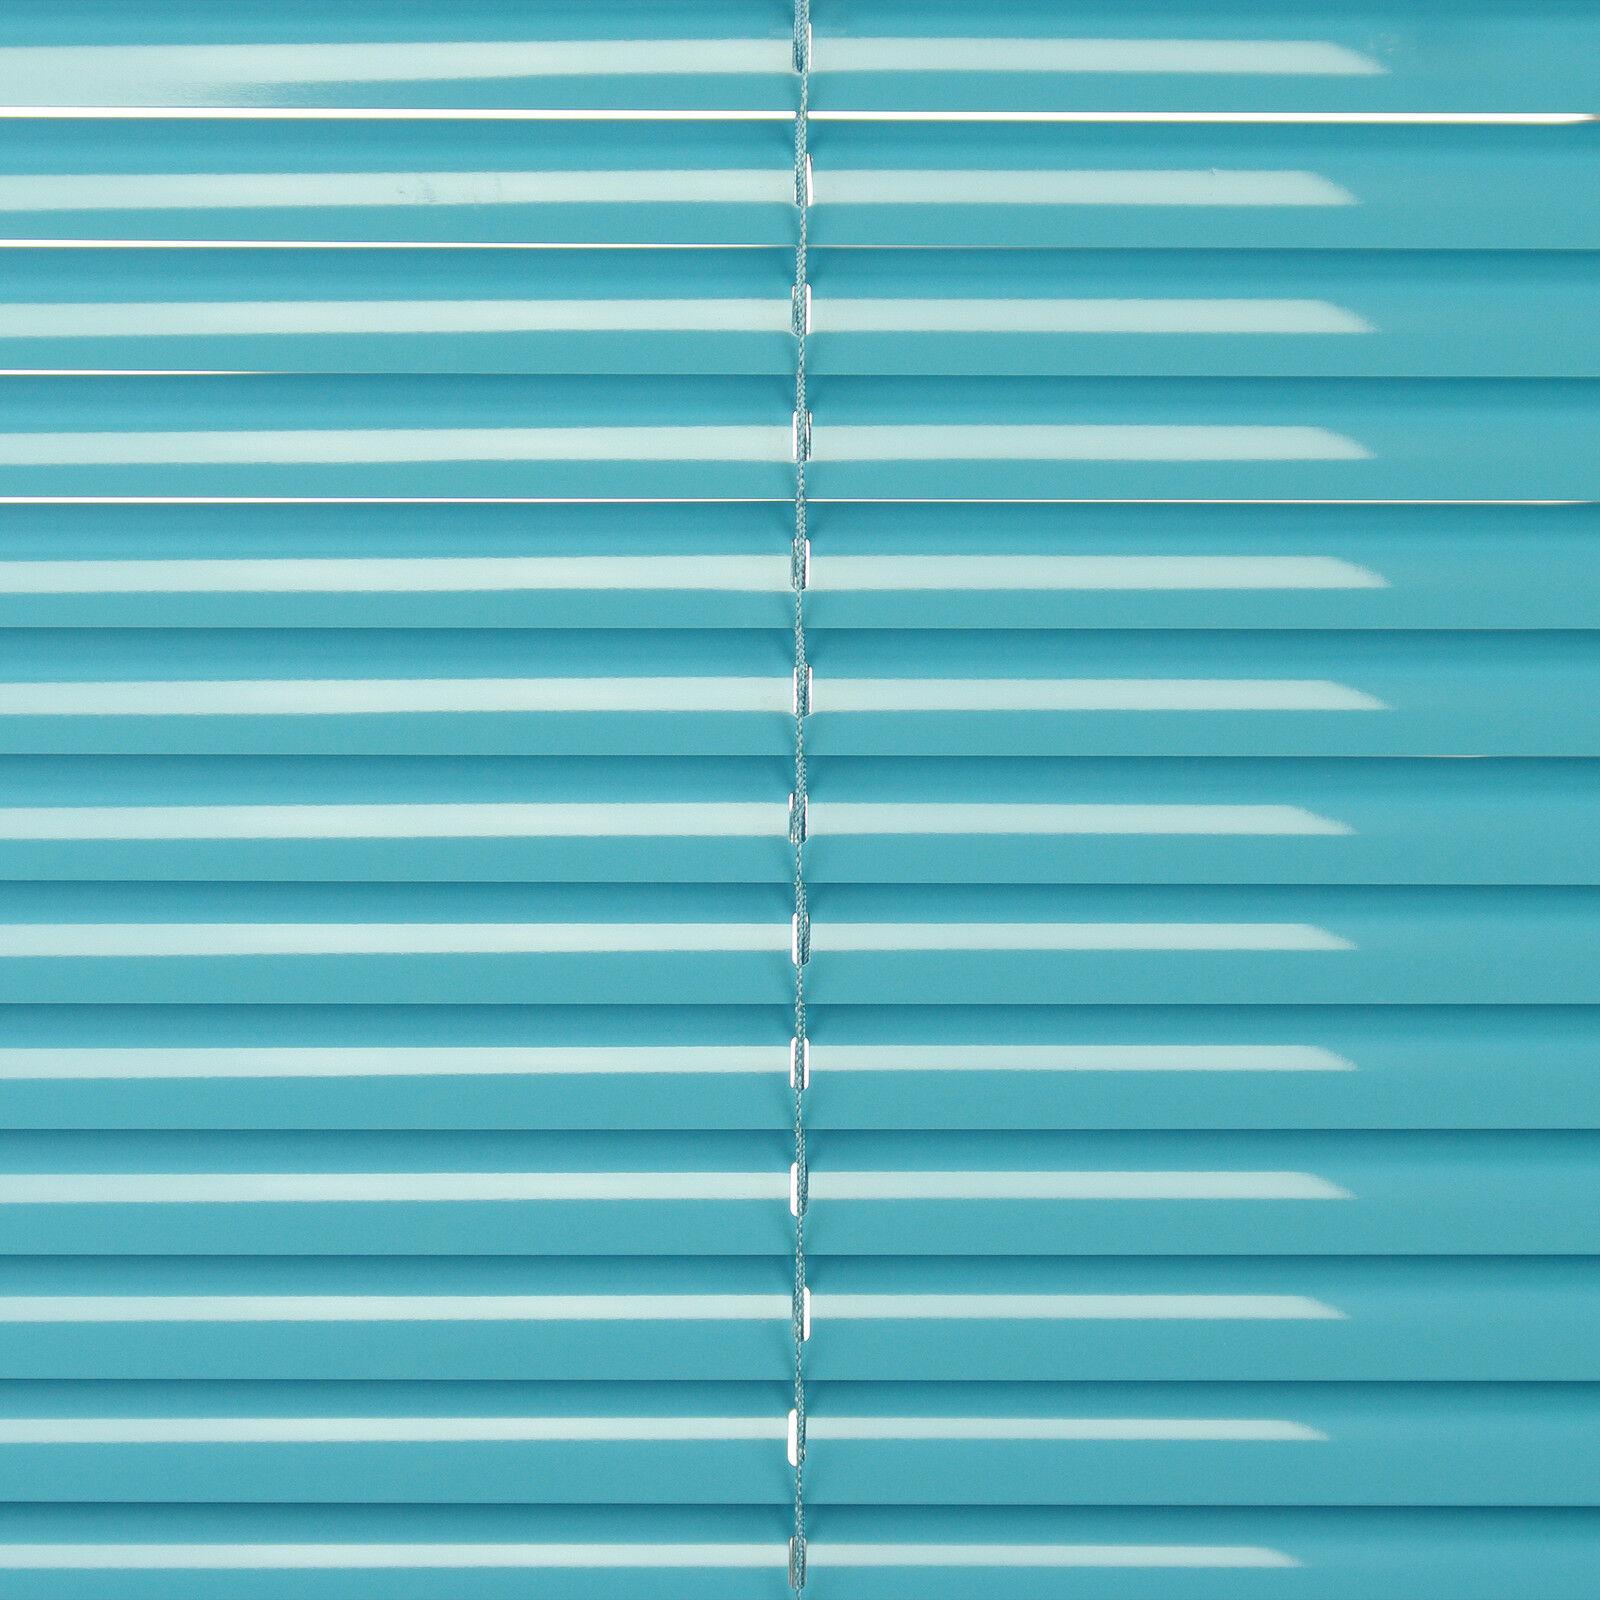 Alu Jalousie Jalousie Jalousie Aluminium Lamelle Fenster Rollo Jalousette 120 x 160 cm Blau Lagoon | Mama kaufte ein bequemes, Baby ist glücklich  7a0452